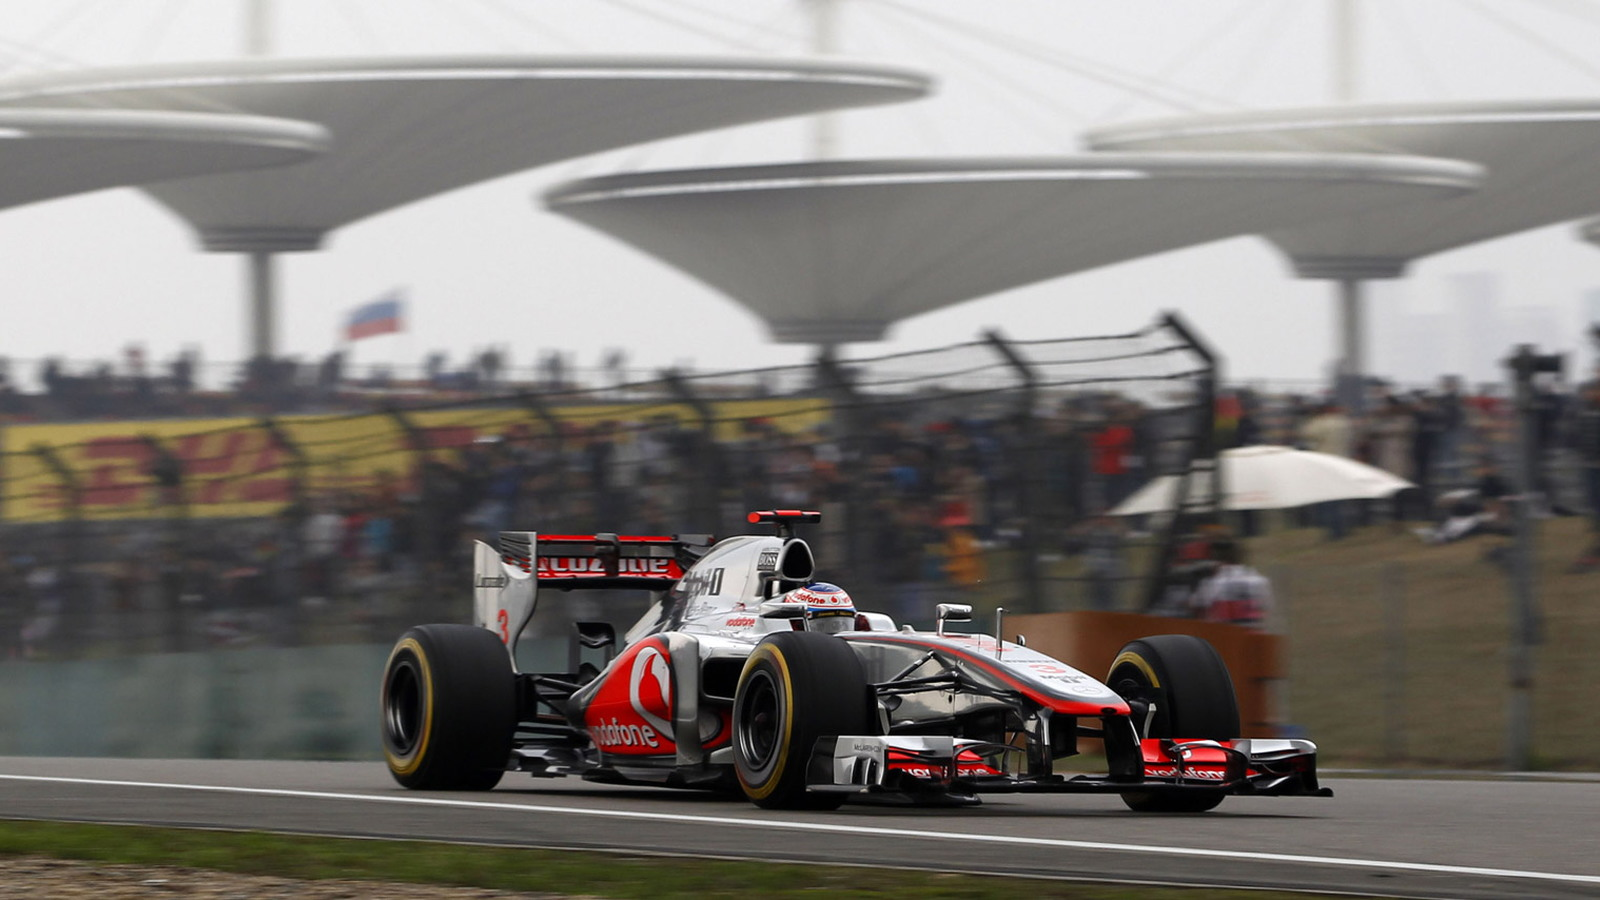 McLaren at the 2012 Formula 1 Chinese Grand Prix